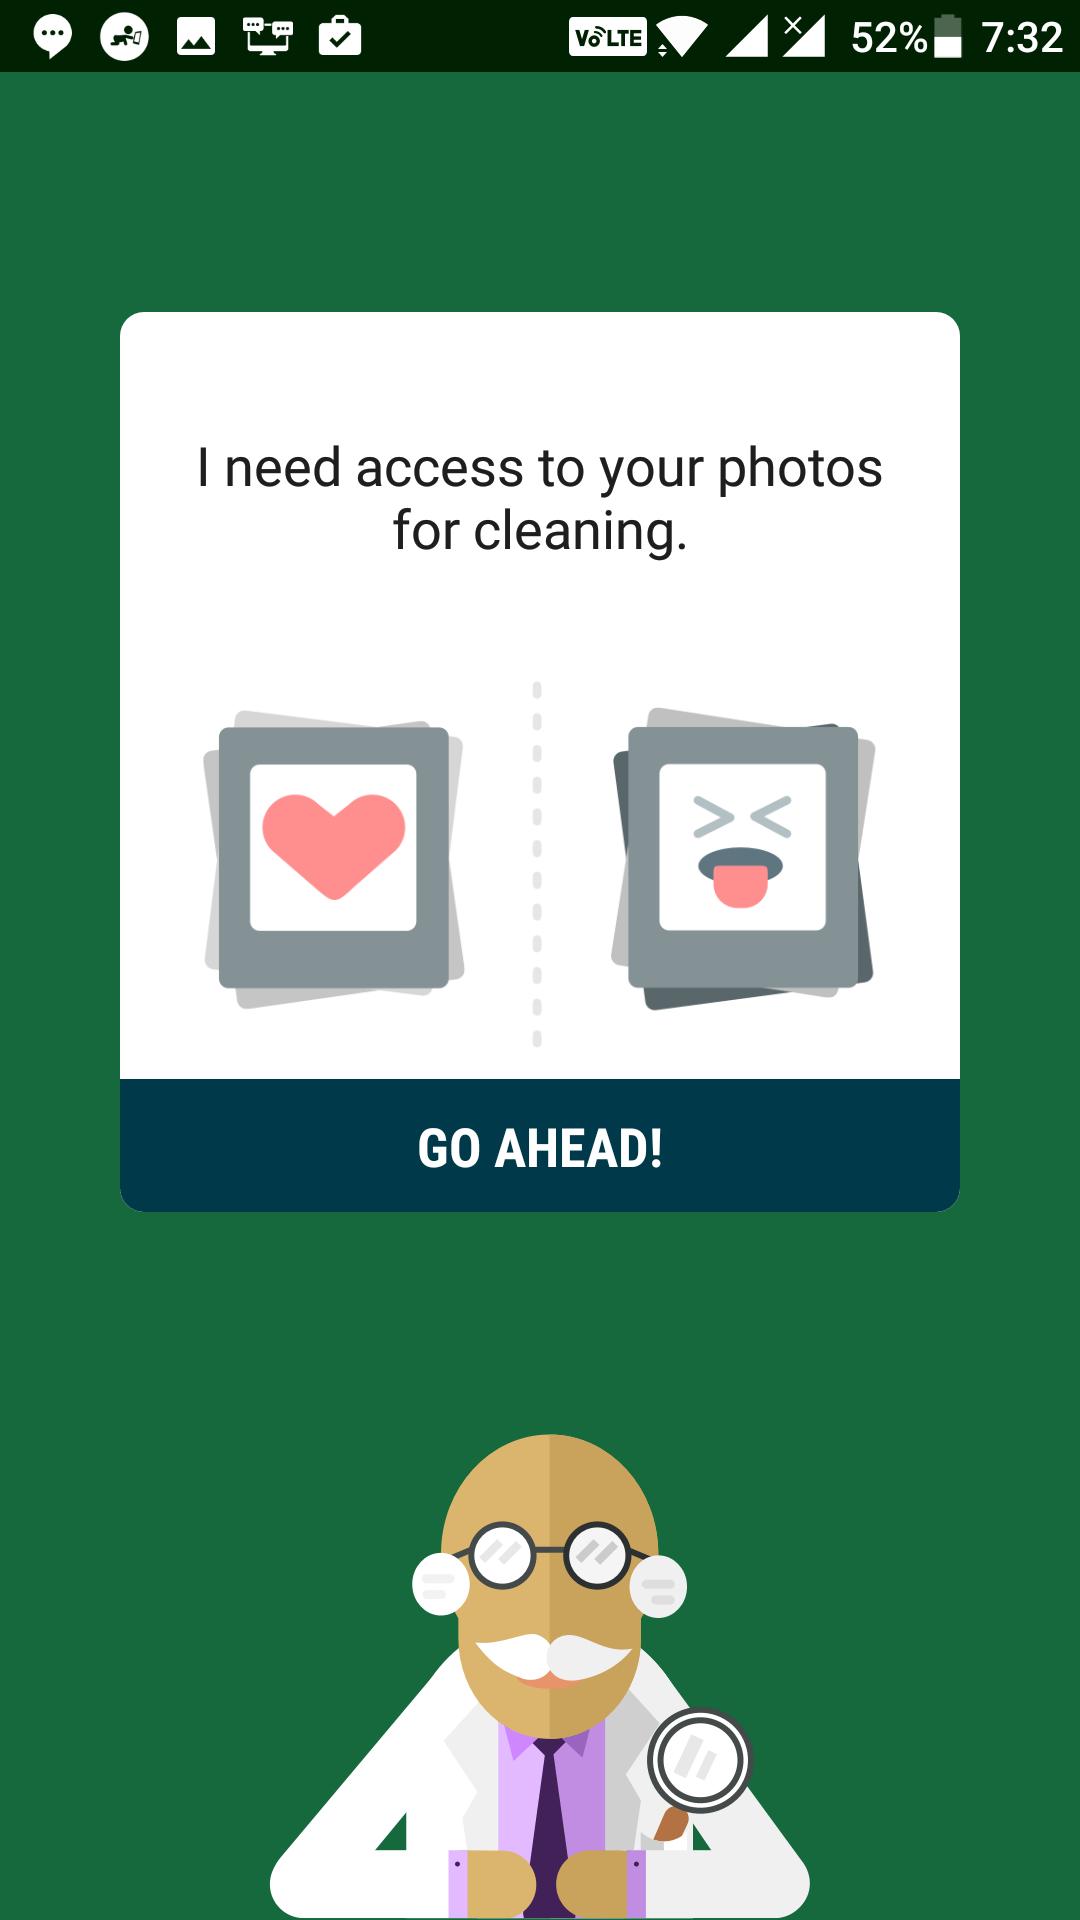 remove-old-whatsapp-photos-go-ahead